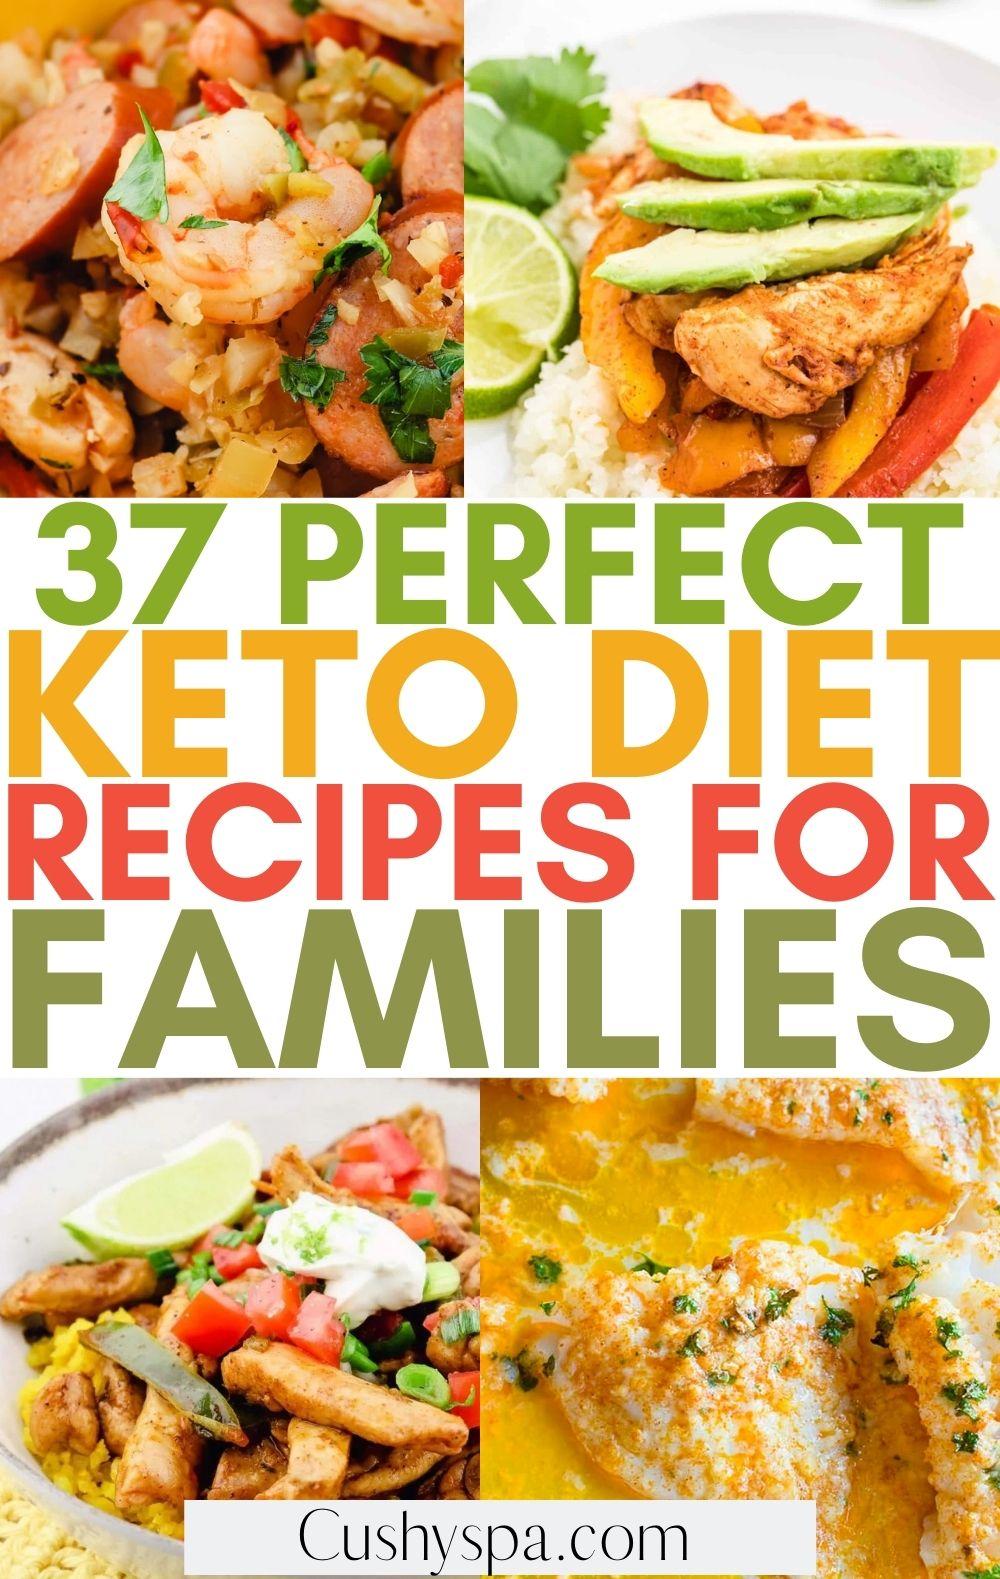 keto recipes for families